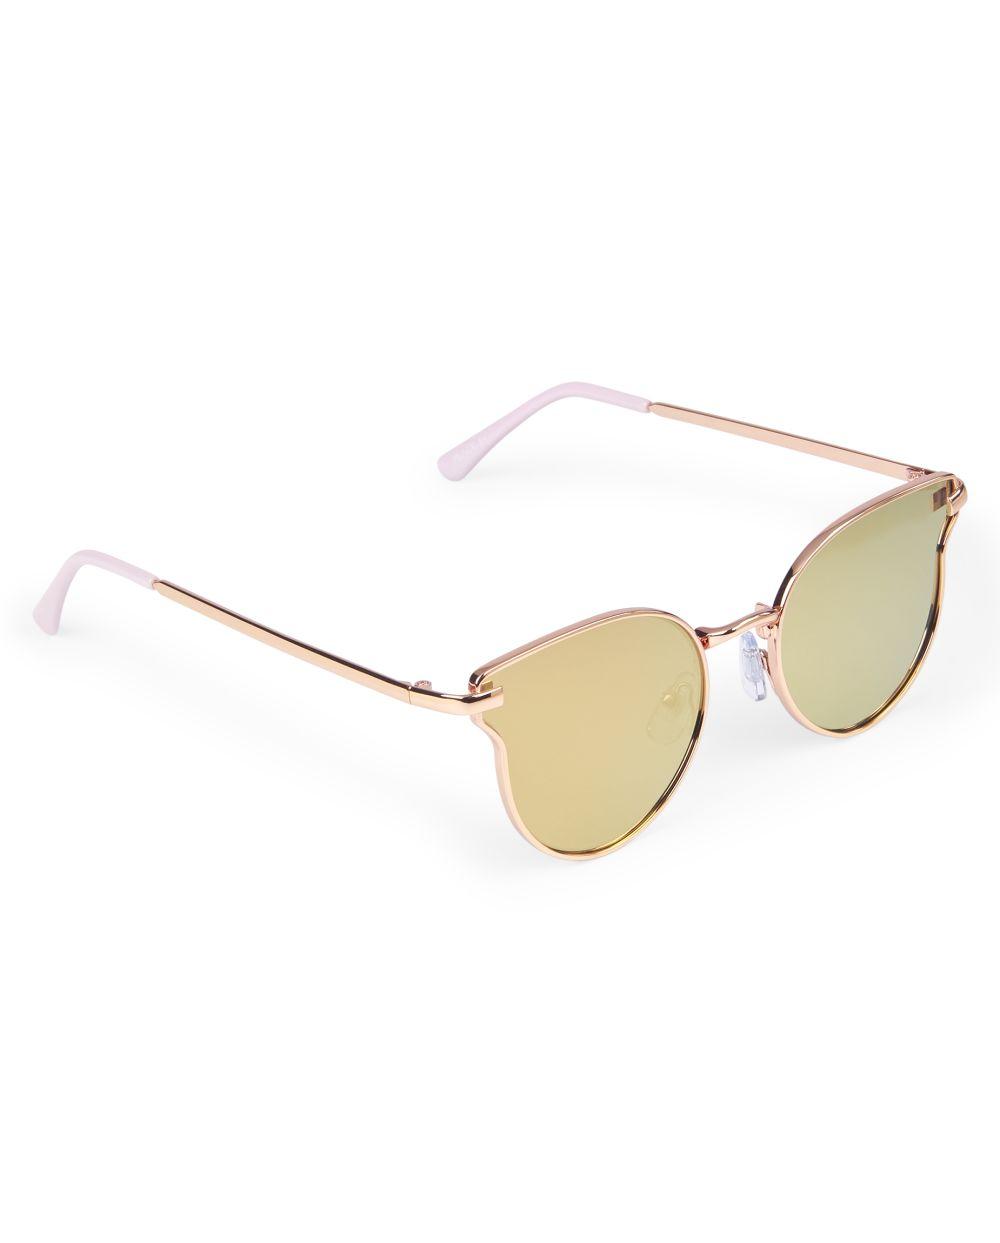 Girls Curved Cat Eye Sunglasses